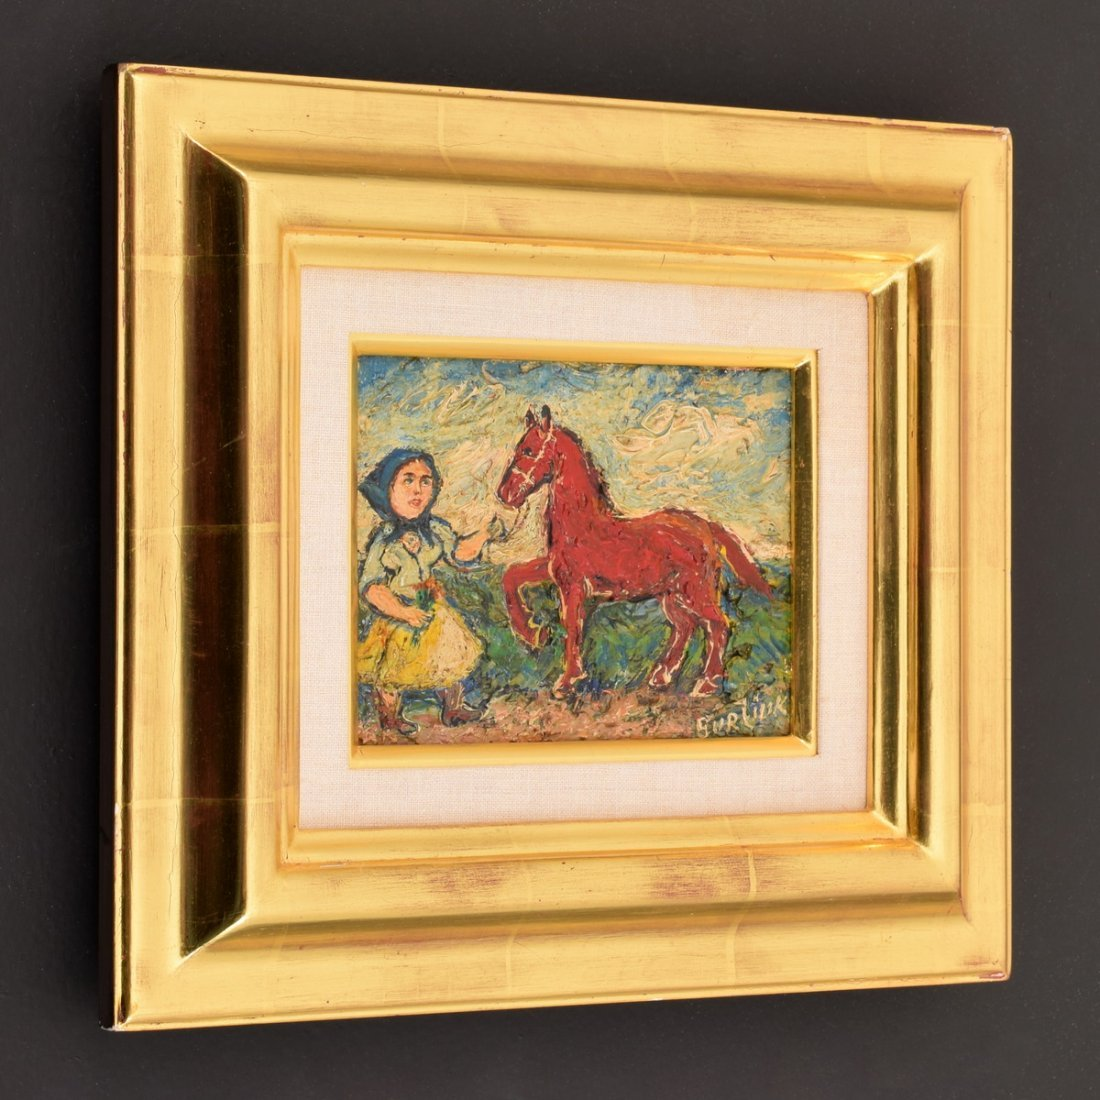 David Burliuk Painting, Peasant Woman and Horse